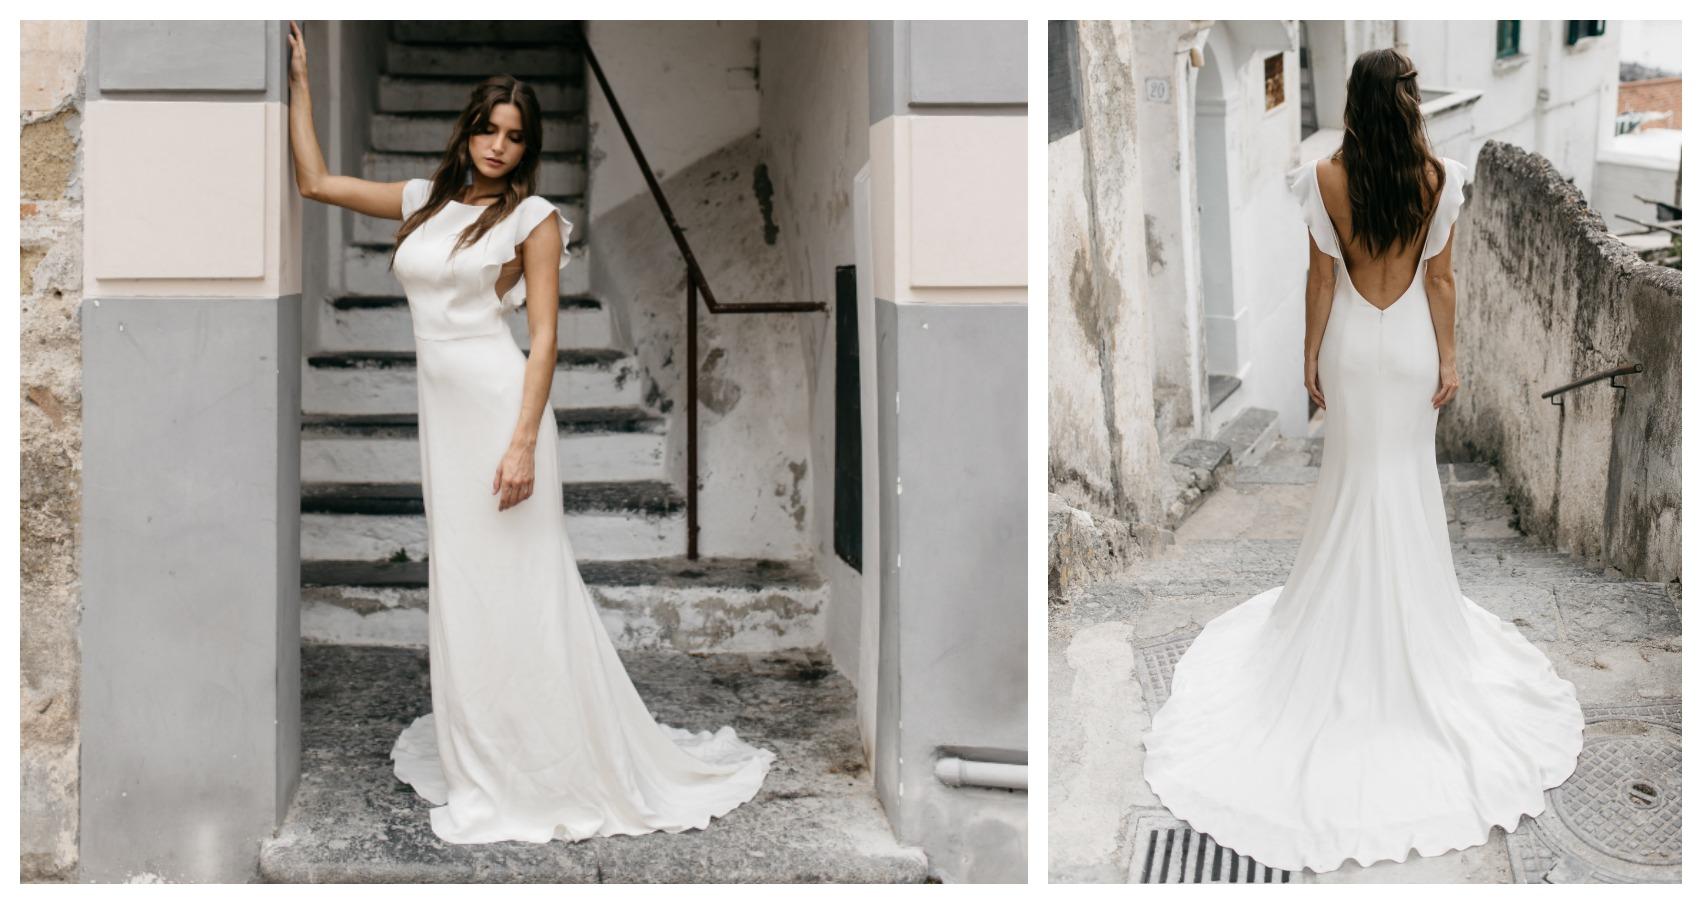 the-coordinated-bride-tara-lauren-flutter-sleeve-open-back-bridal-jpg